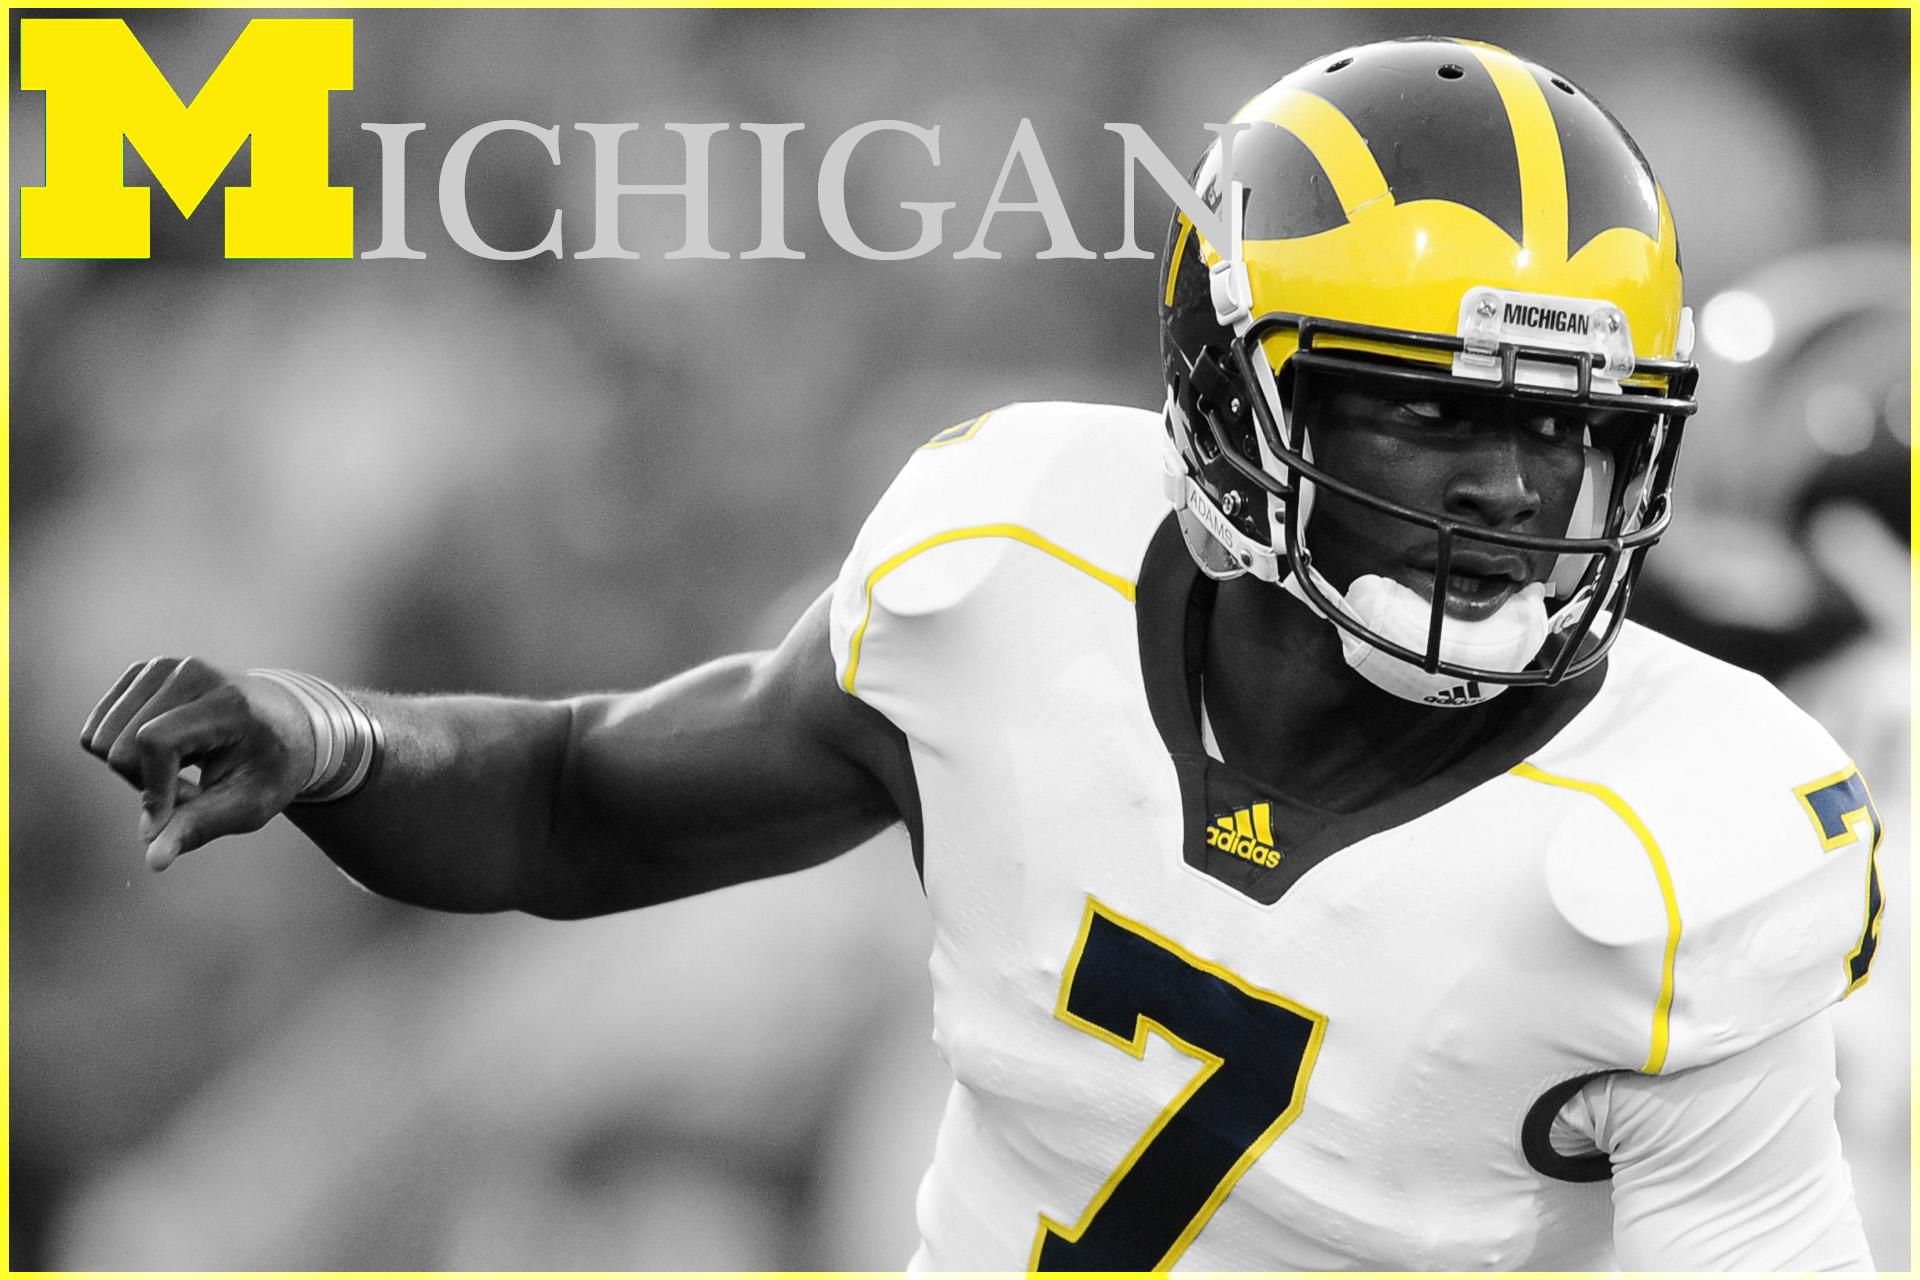 Ohio State Football Wallpaper >> Michigan Wolverines Football Wallpapers (34 Wallpapers) – Adorable Wallpapers